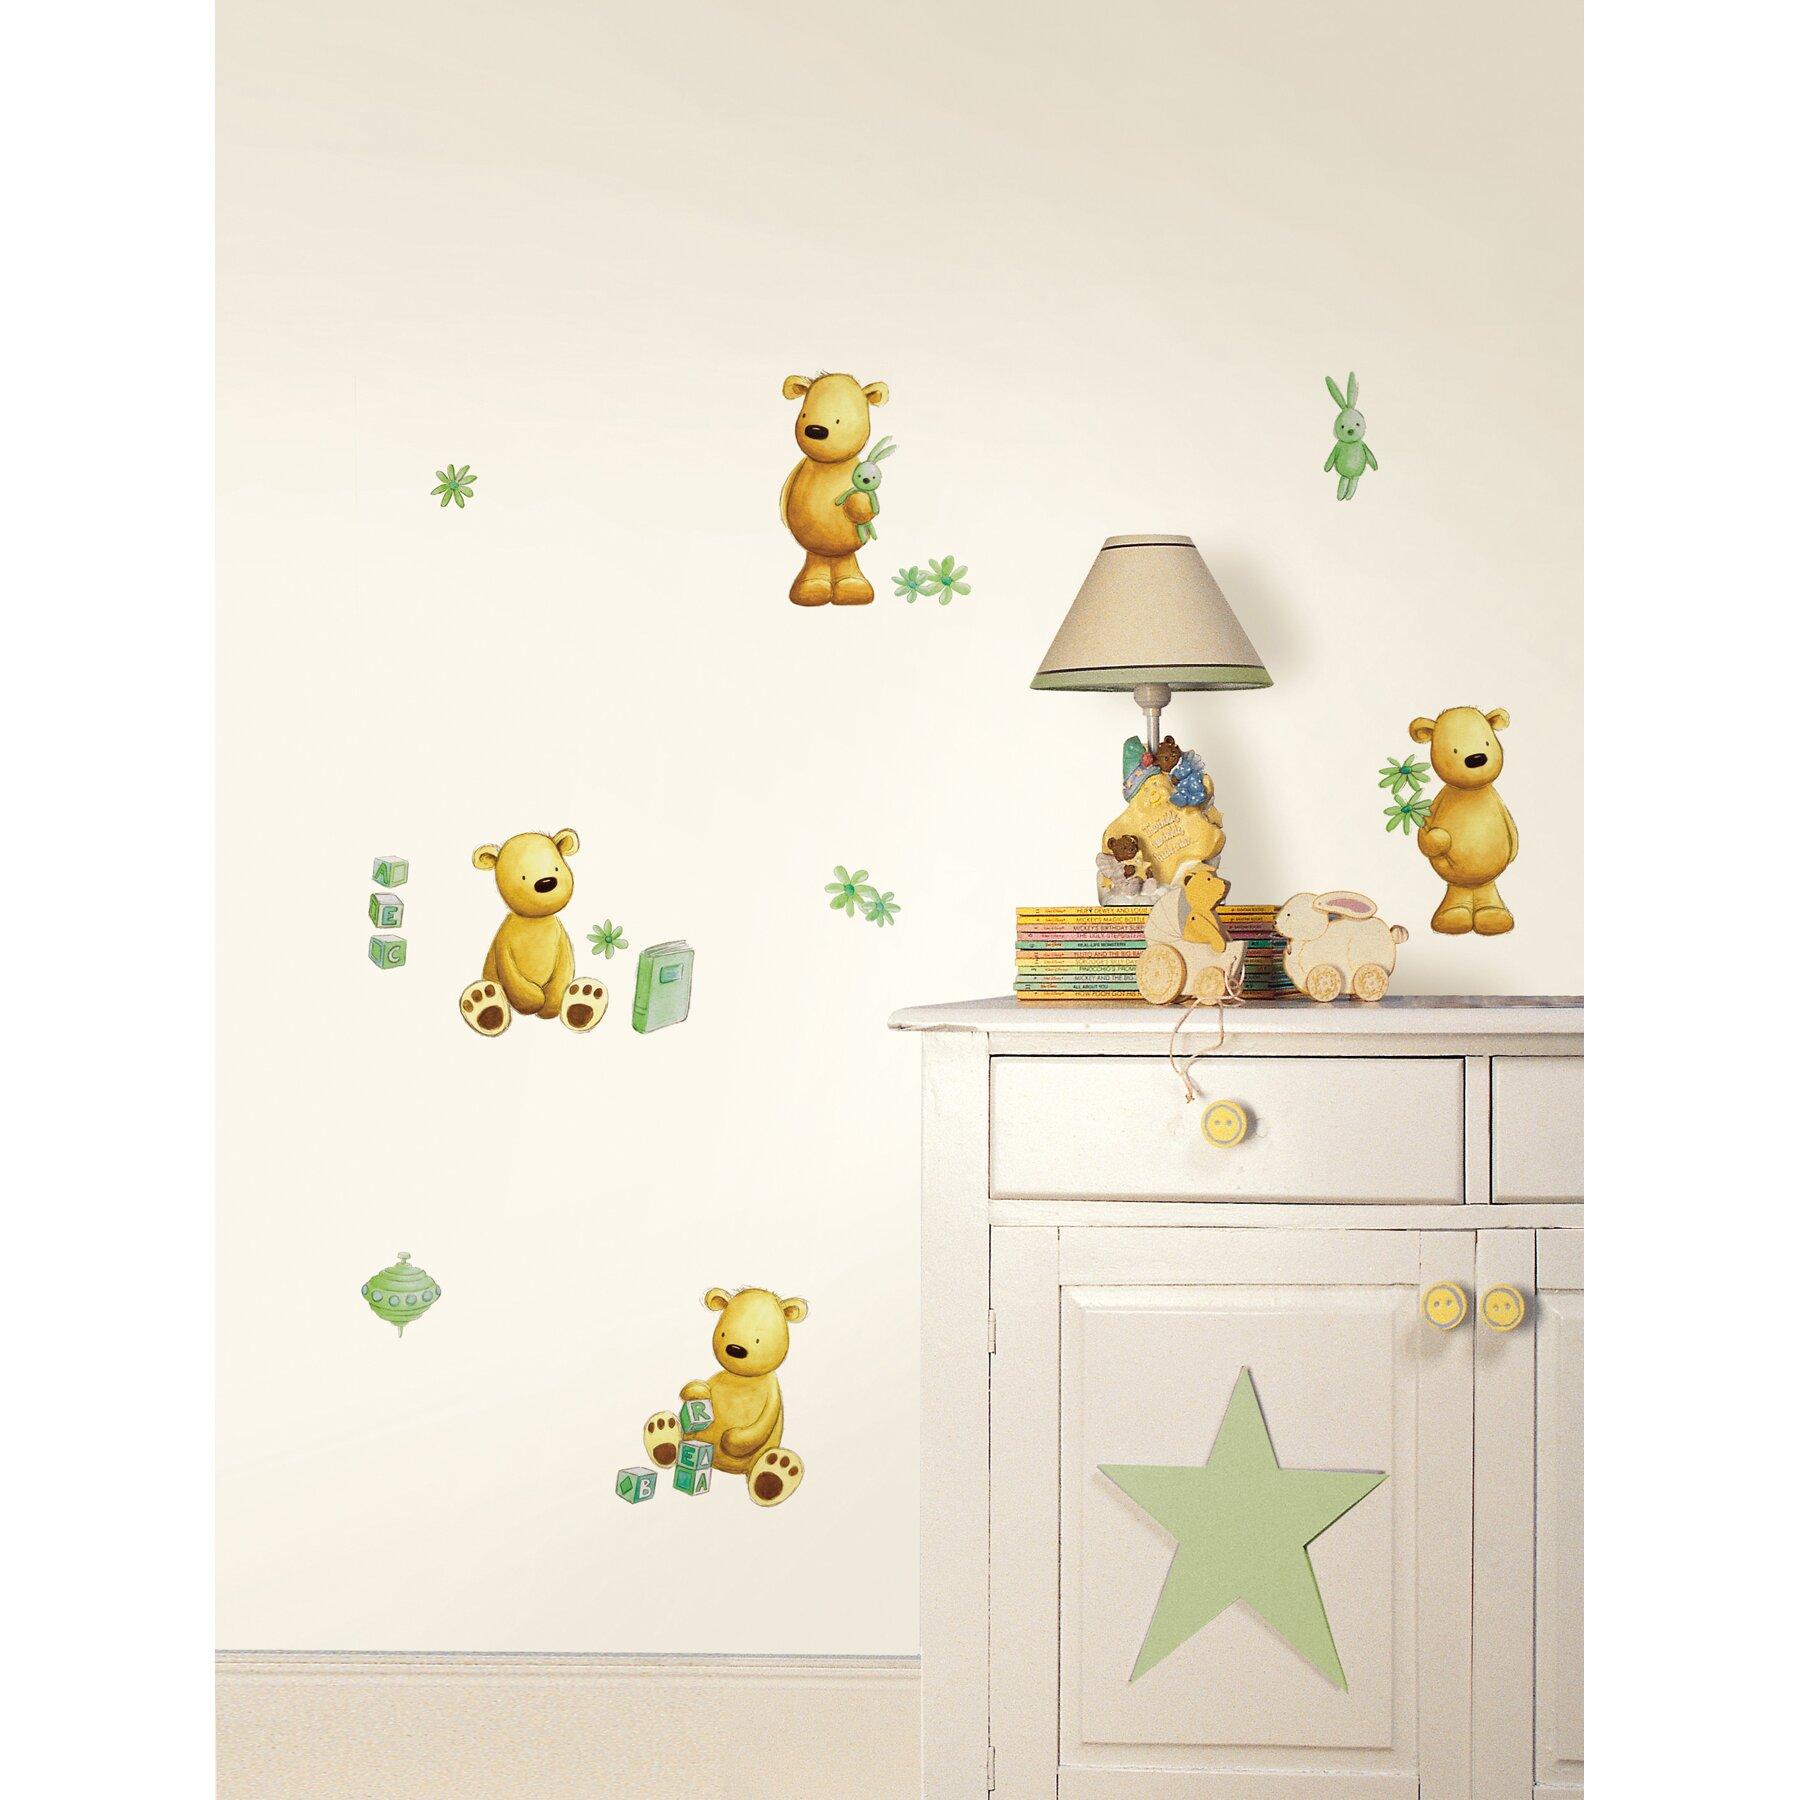 fun4walls teddy bear wall decal wayfair masha and the bear wall sticker childrens bedroom wall decal